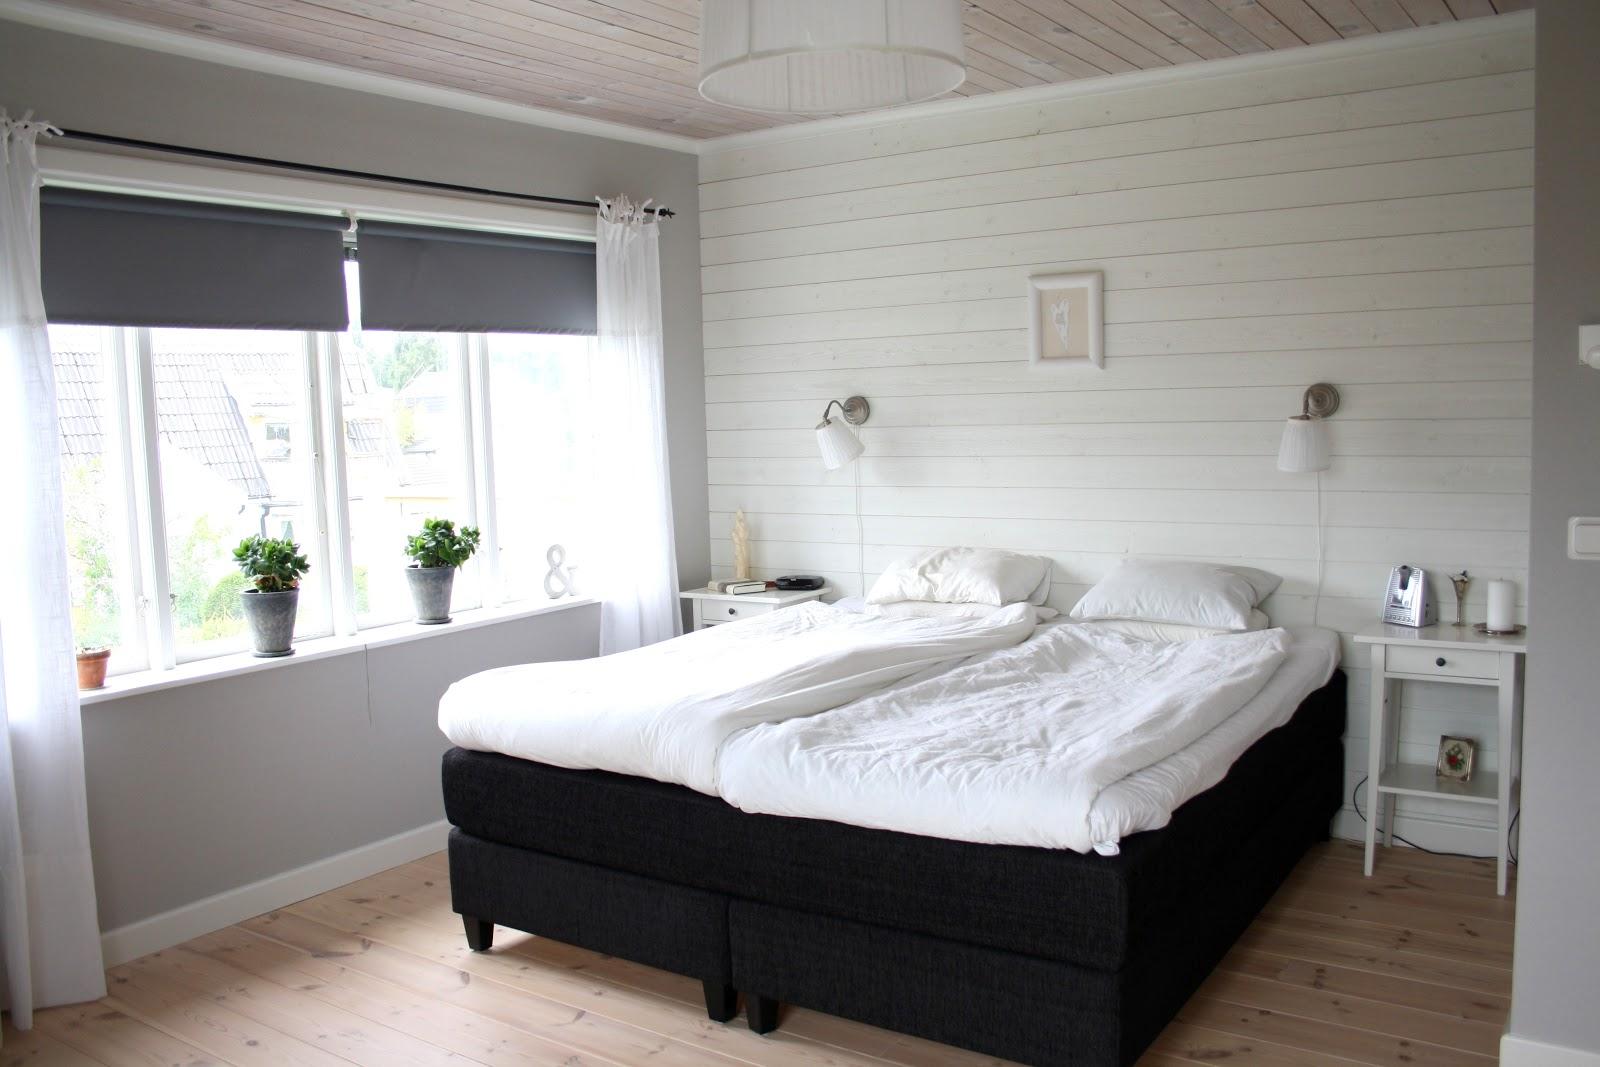 Dagdrömmar& Verklighet Vårt sovrum